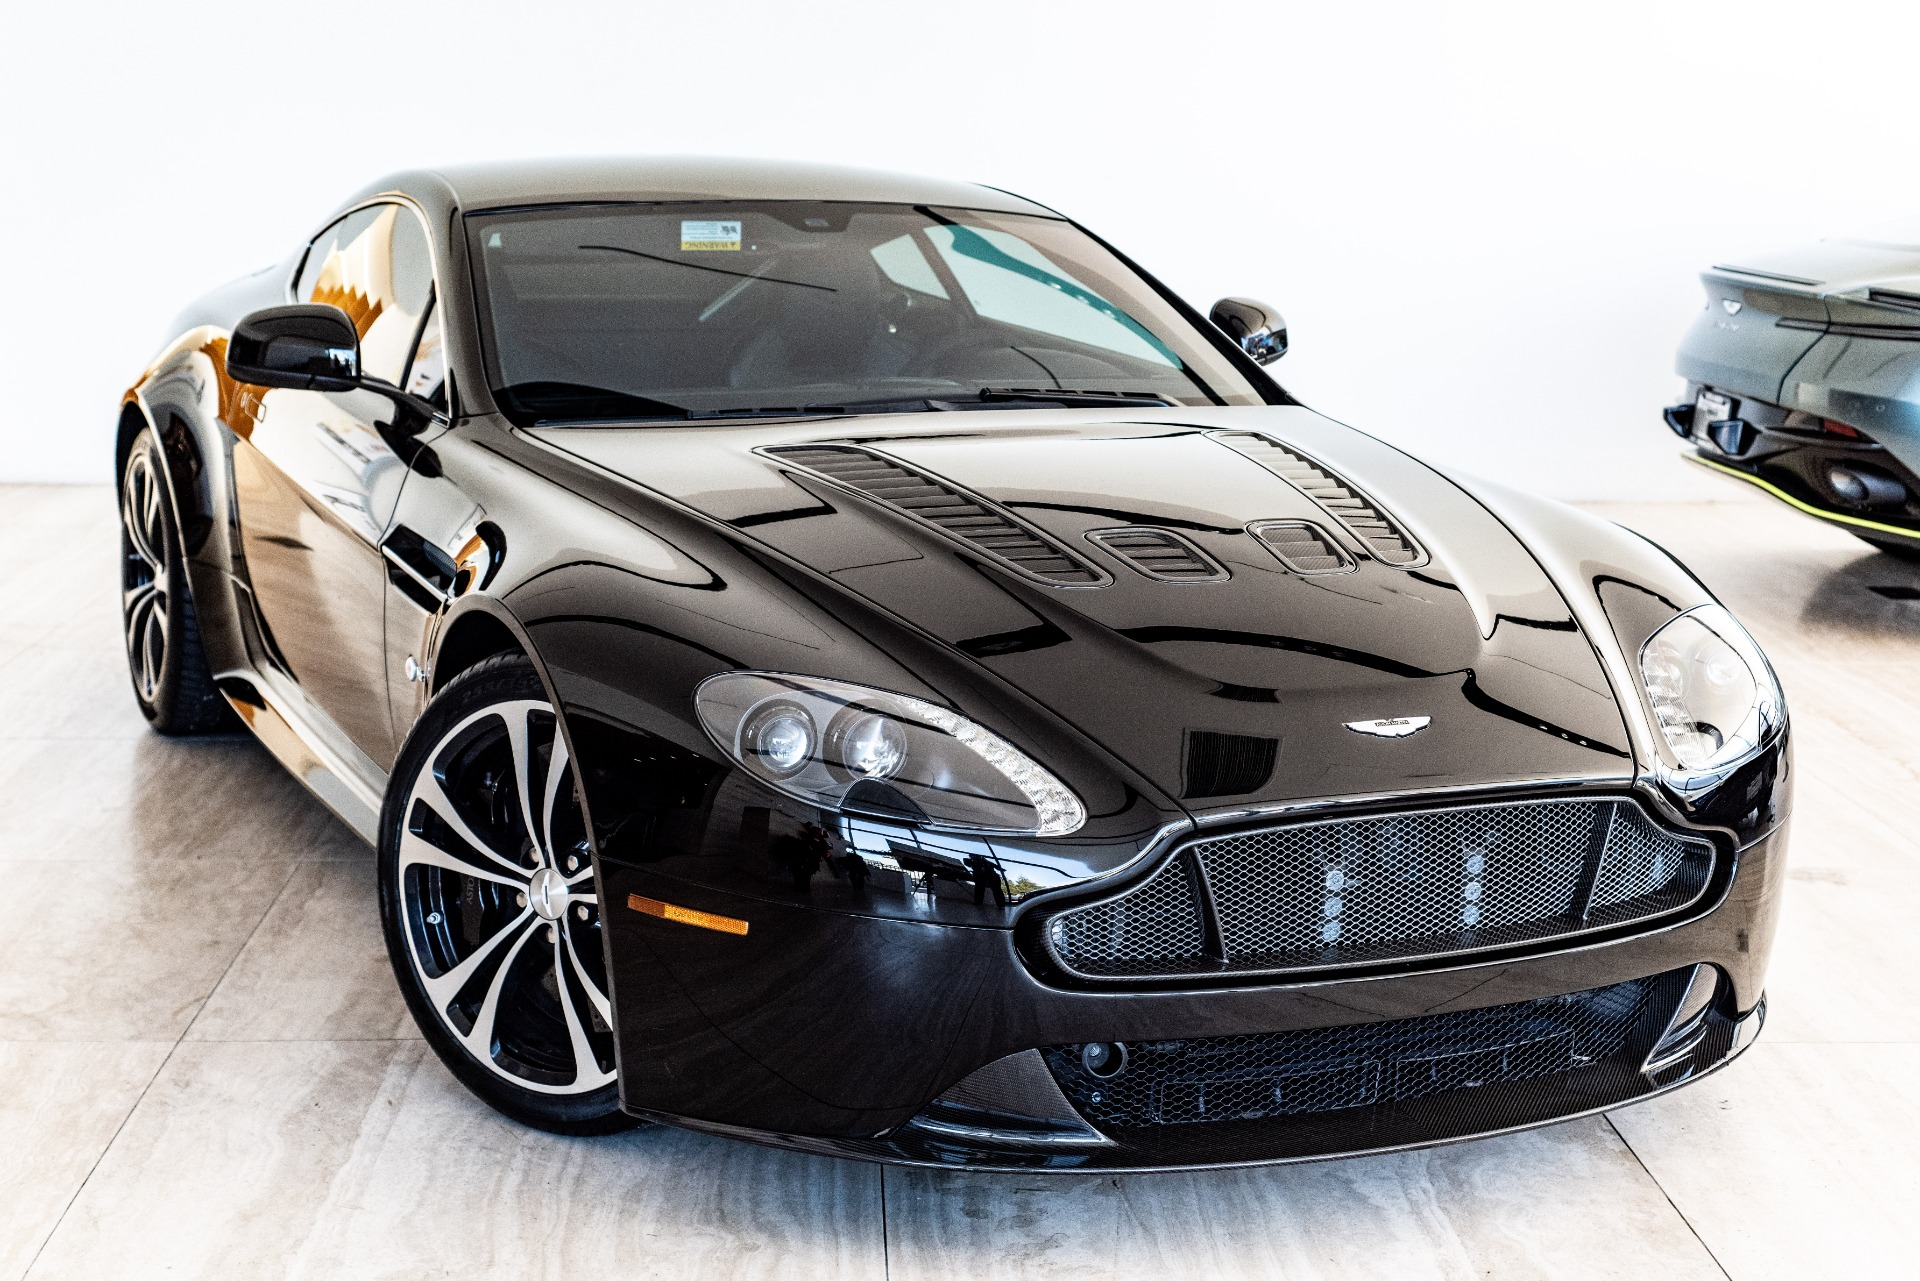 2015 Aston Martin V12 Vantage S Stock Ps01899 For Sale Near Vienna Va Va Aston Martin Dealer For Sale In Vienna Va Ps01899 Exclusive Automotive Group